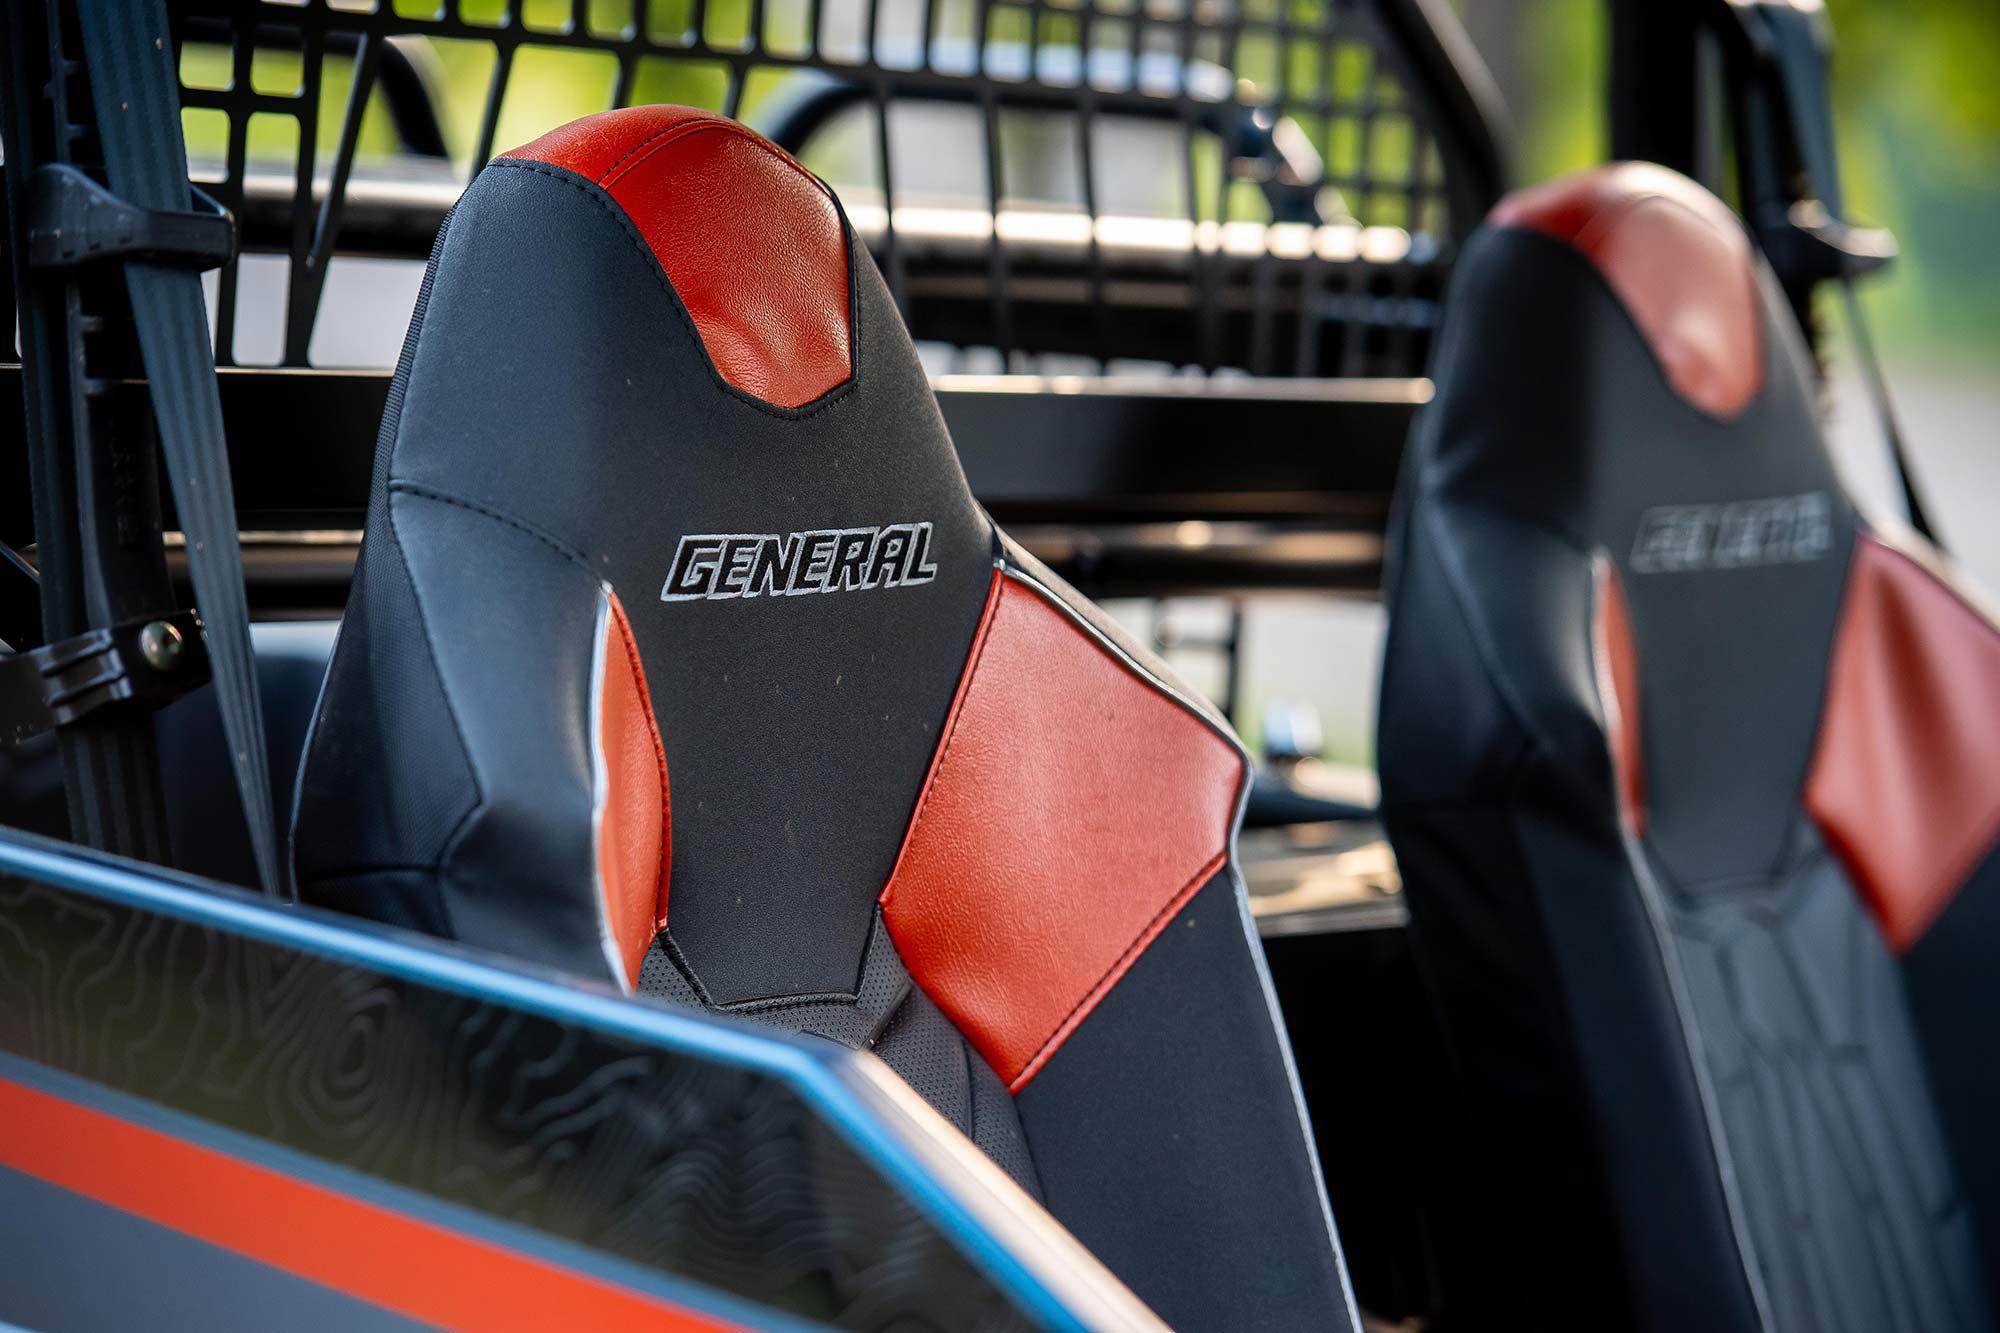 Premium two-tone bolstered seats keep passengers comfortable.